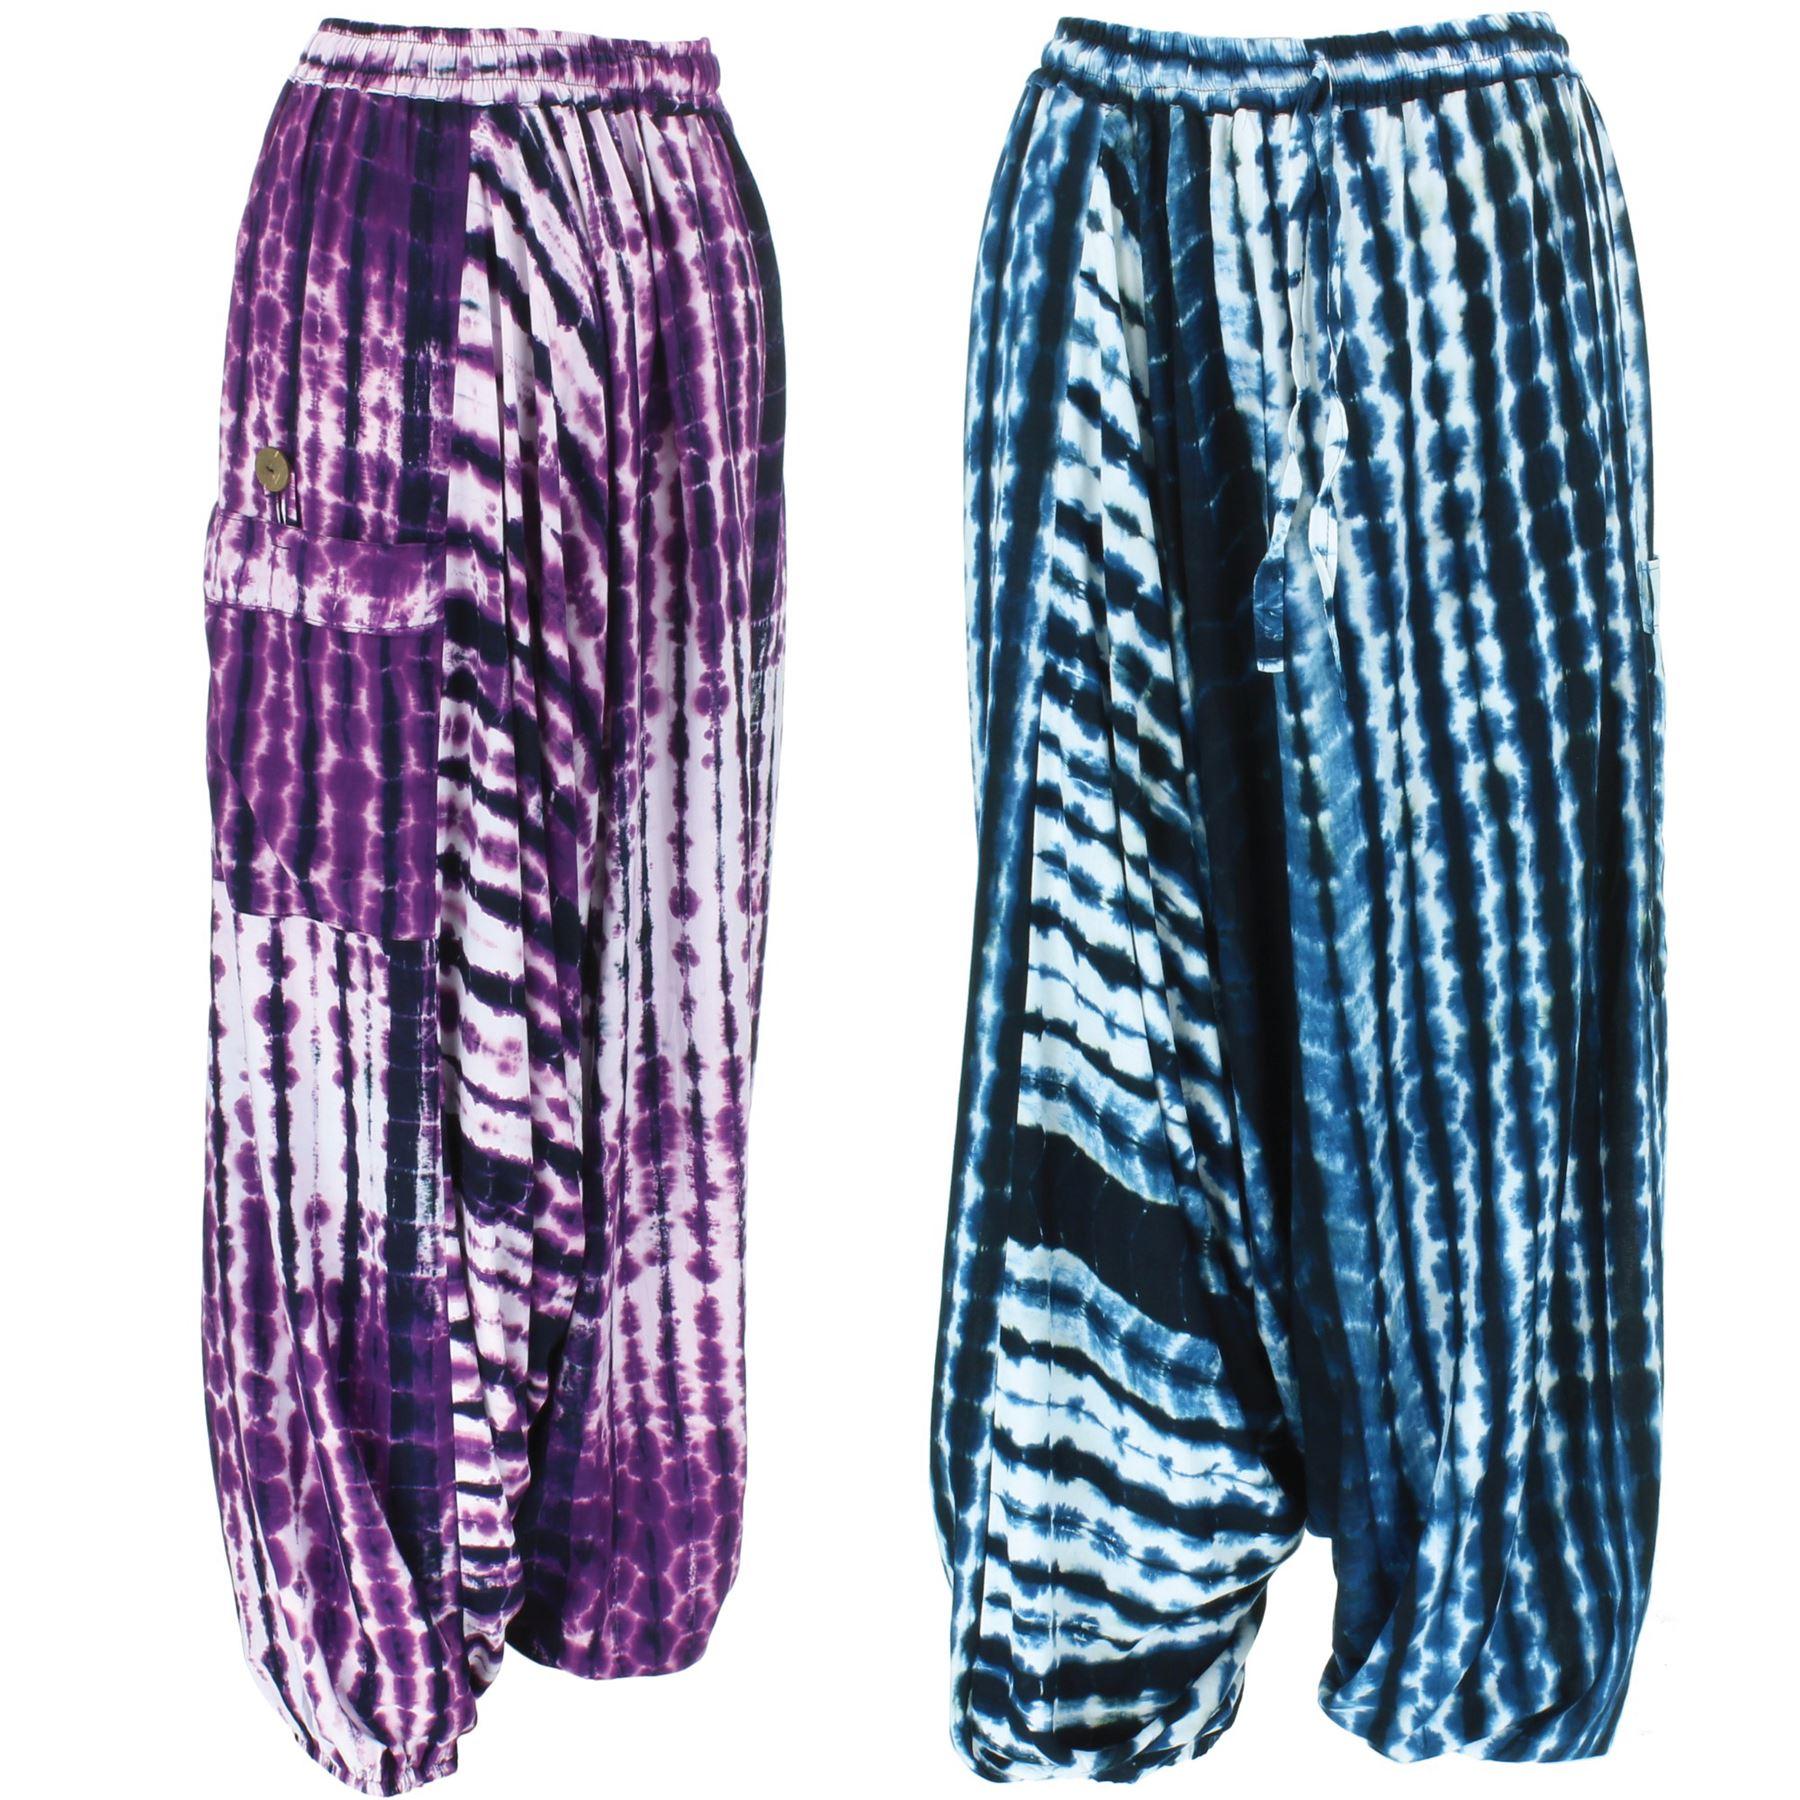 New Ladies Pants Alibaba Italian Lagenlook TieDye Harem Baggy Trousers *5CLRS*